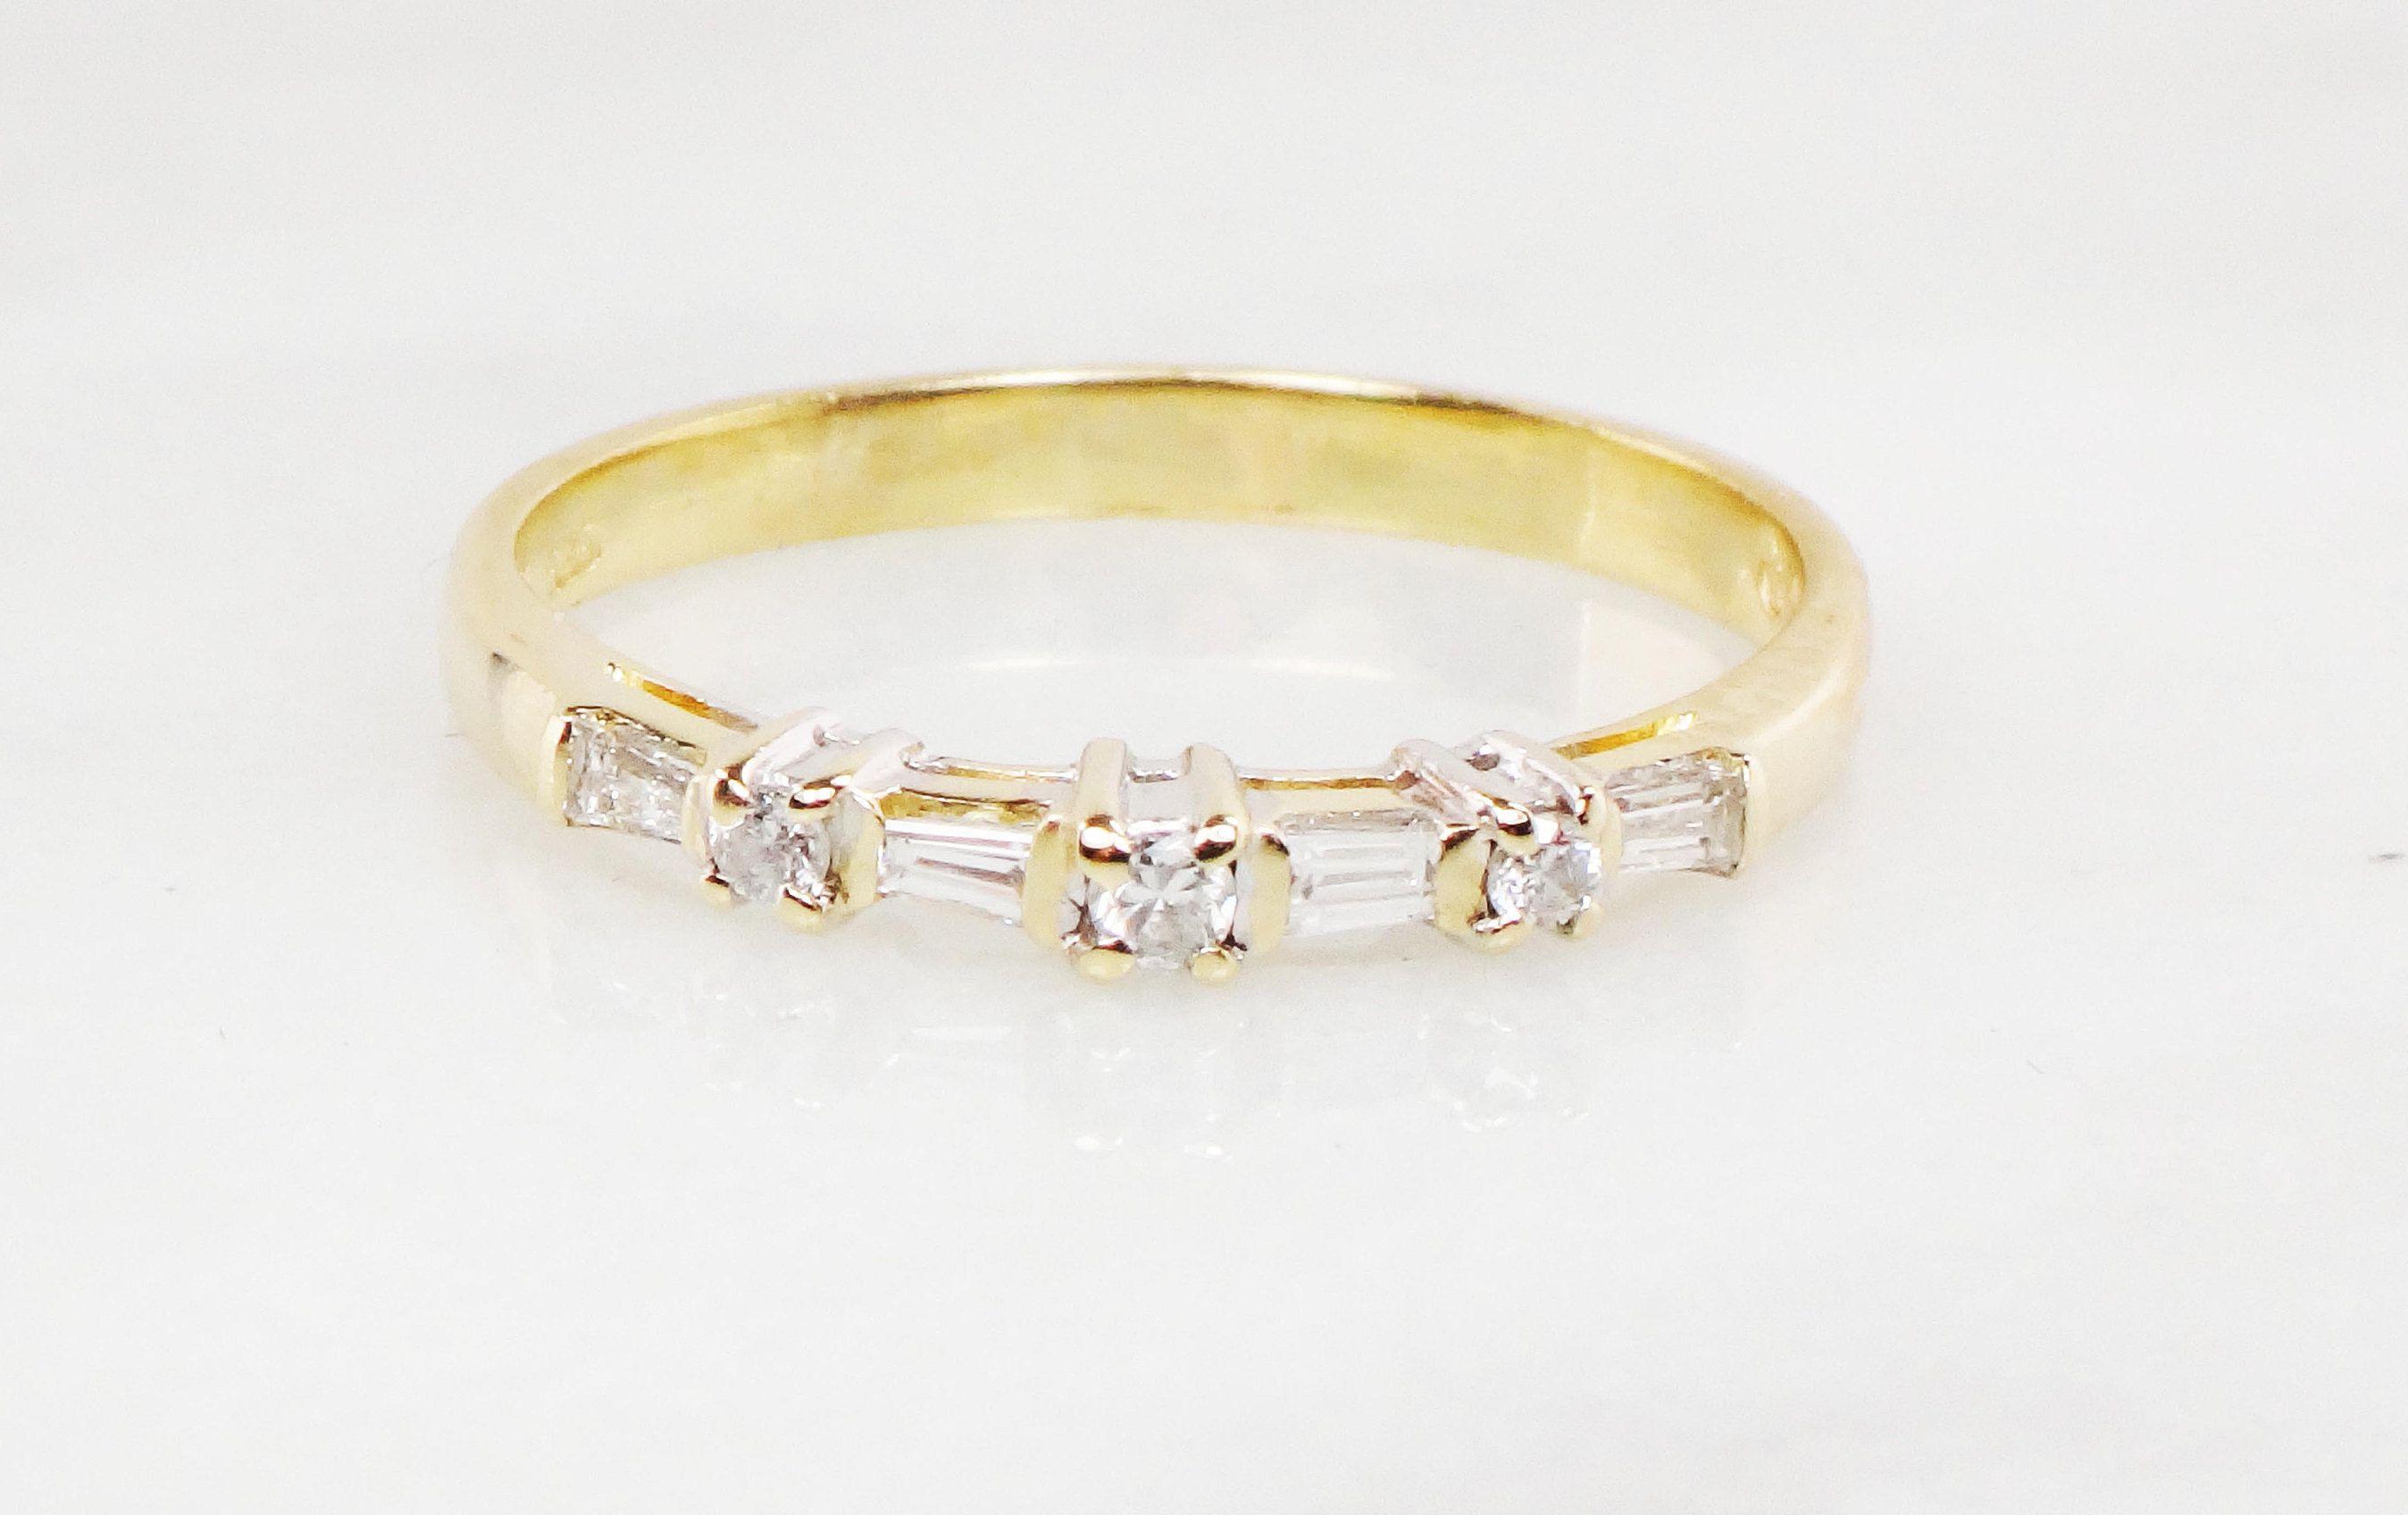 Vintage Diamond Wedding Band 14k Yellow Gold Diamond Wedding Ring Baguette And R Vintage Diamond Wedding Bands Diamond Wedding Bands Gold Diamond Wedding Rings